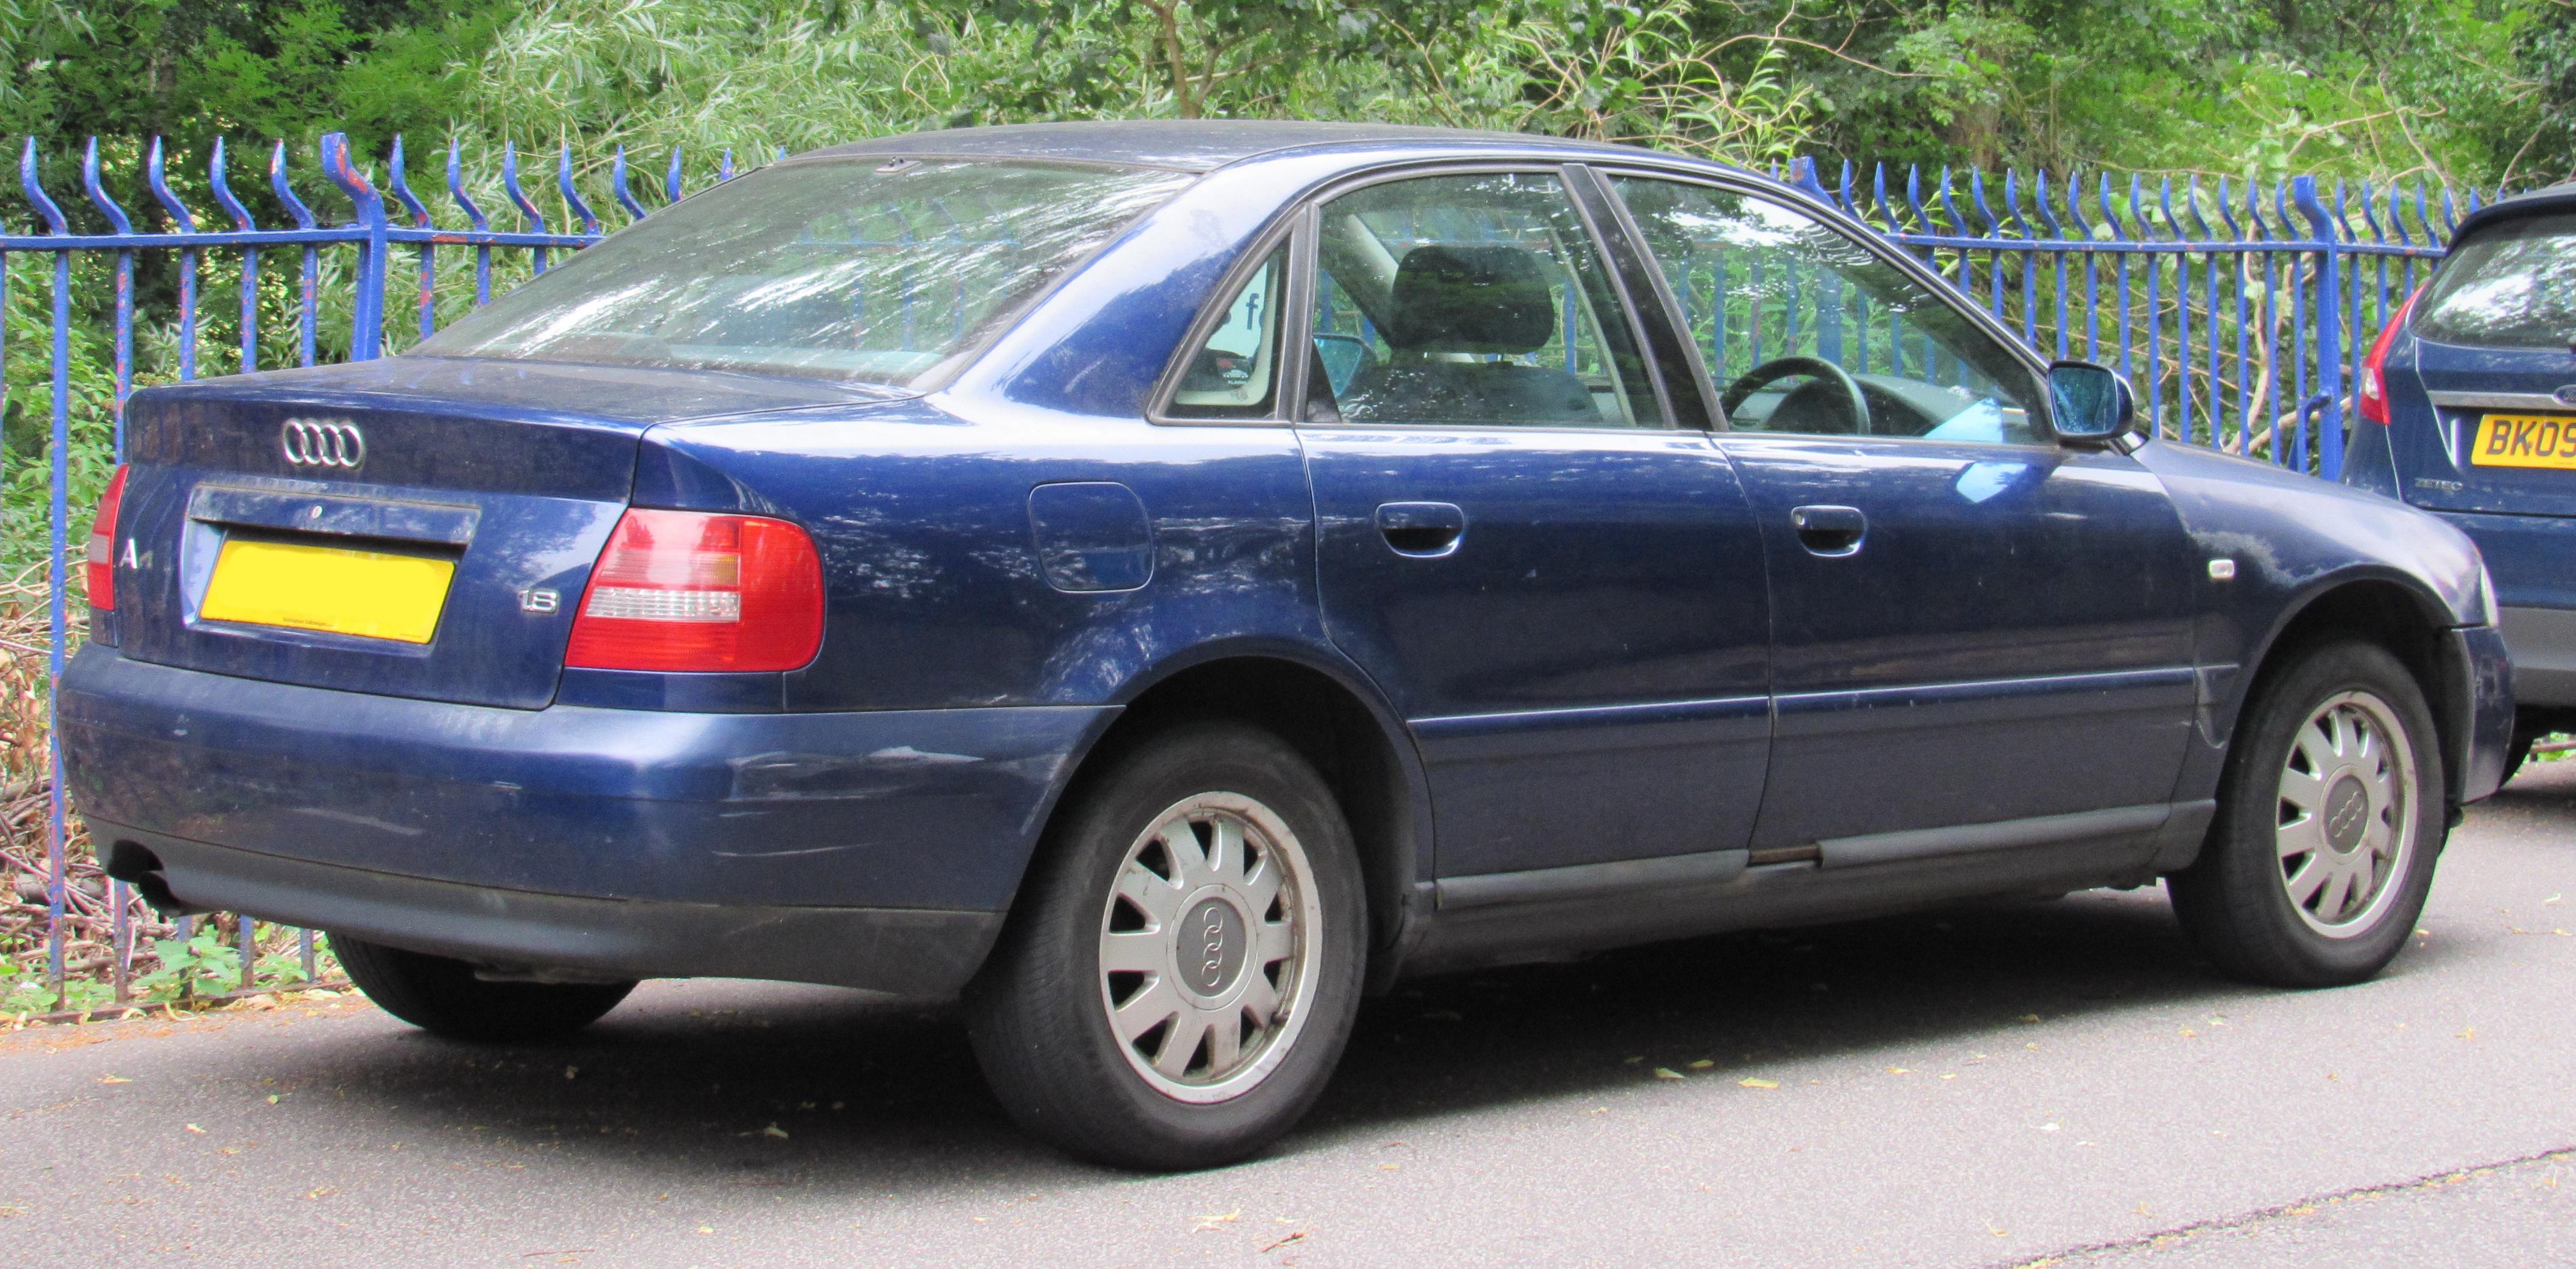 Kelebihan Kekurangan Audi A4 1999 Murah Berkualitas